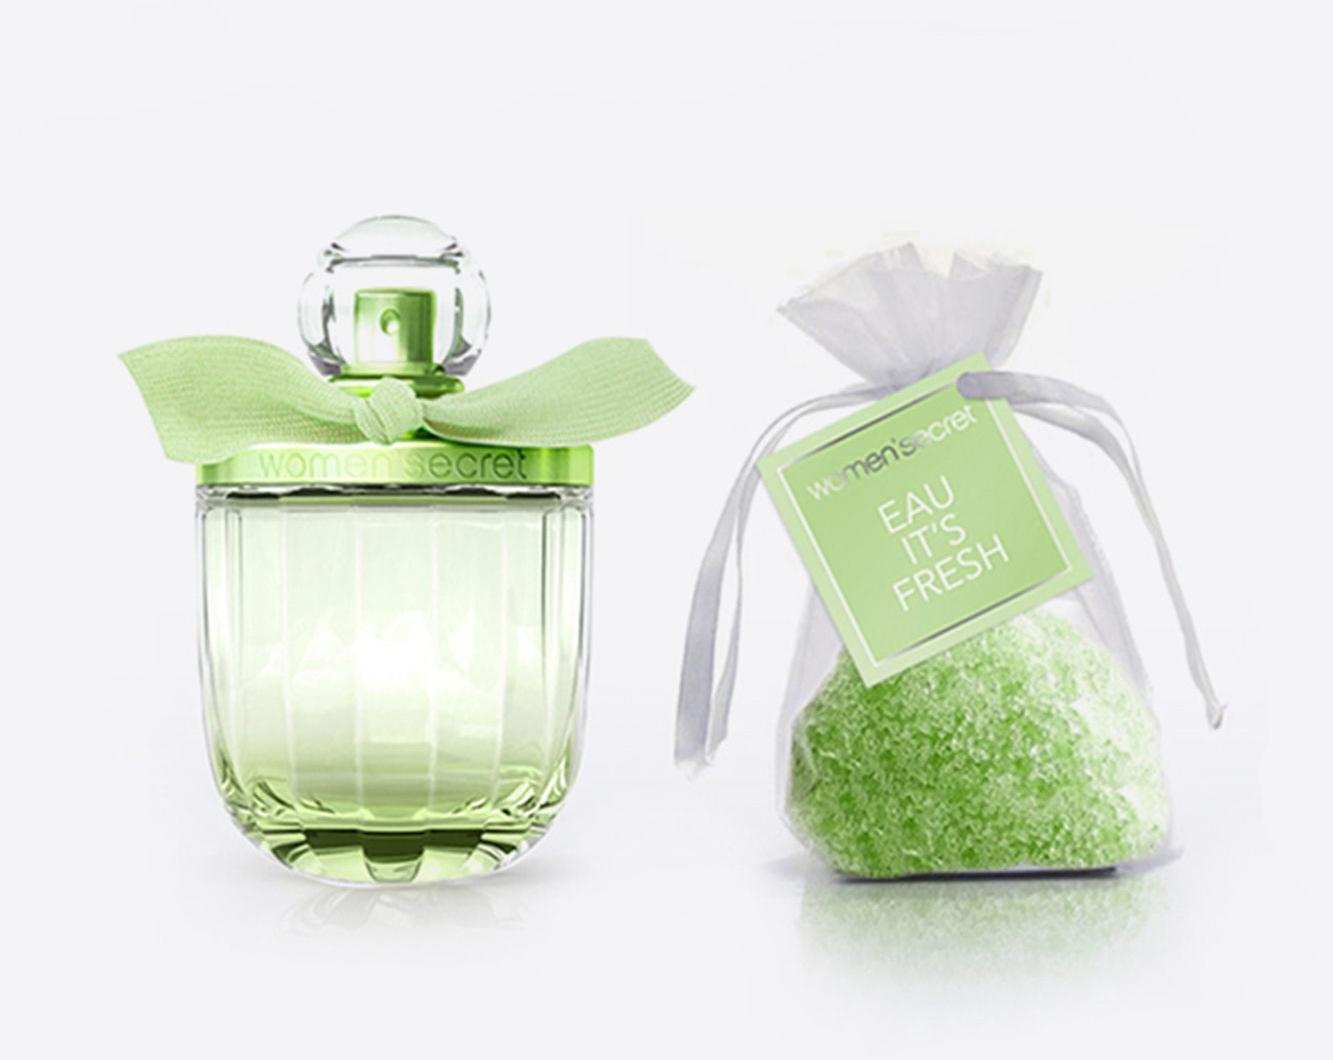 women secret perfume